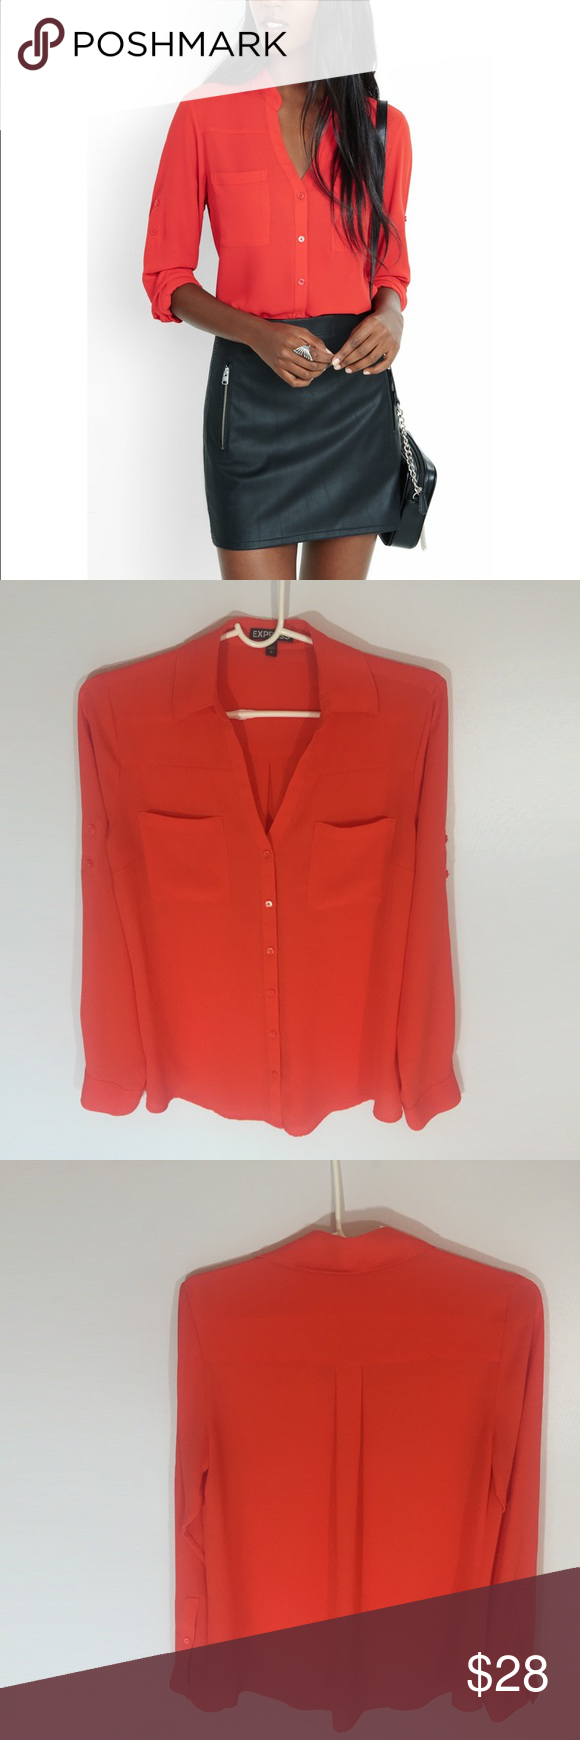 3c09e6245115 Express Neon Orange Portofino Shirt